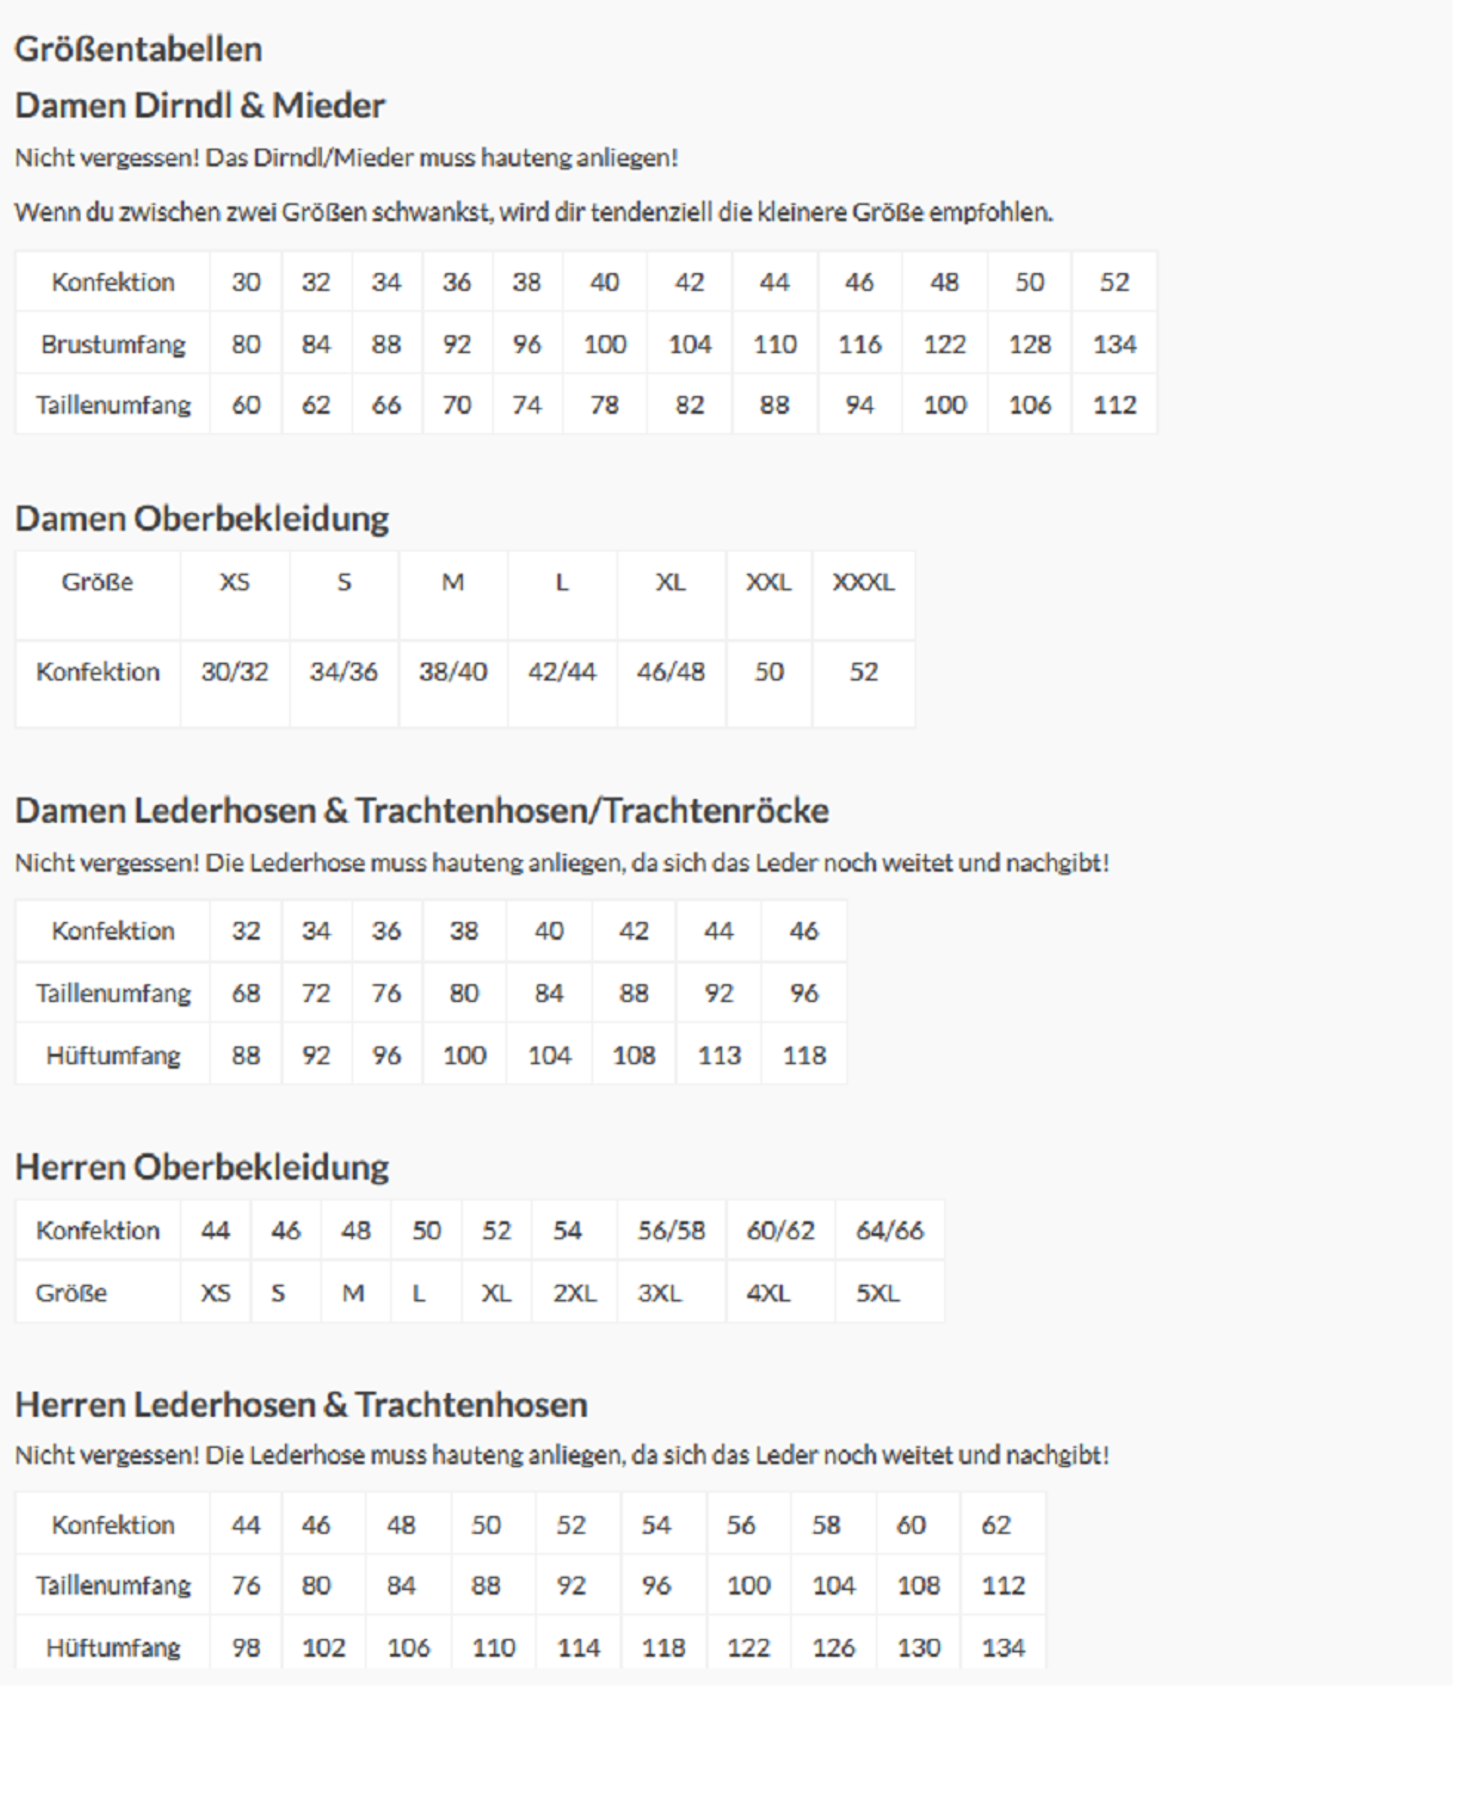 Krüger - Damen Dirndlbluse, Märchenhaft (Artikelnummer: 31160-2) – Bild 4